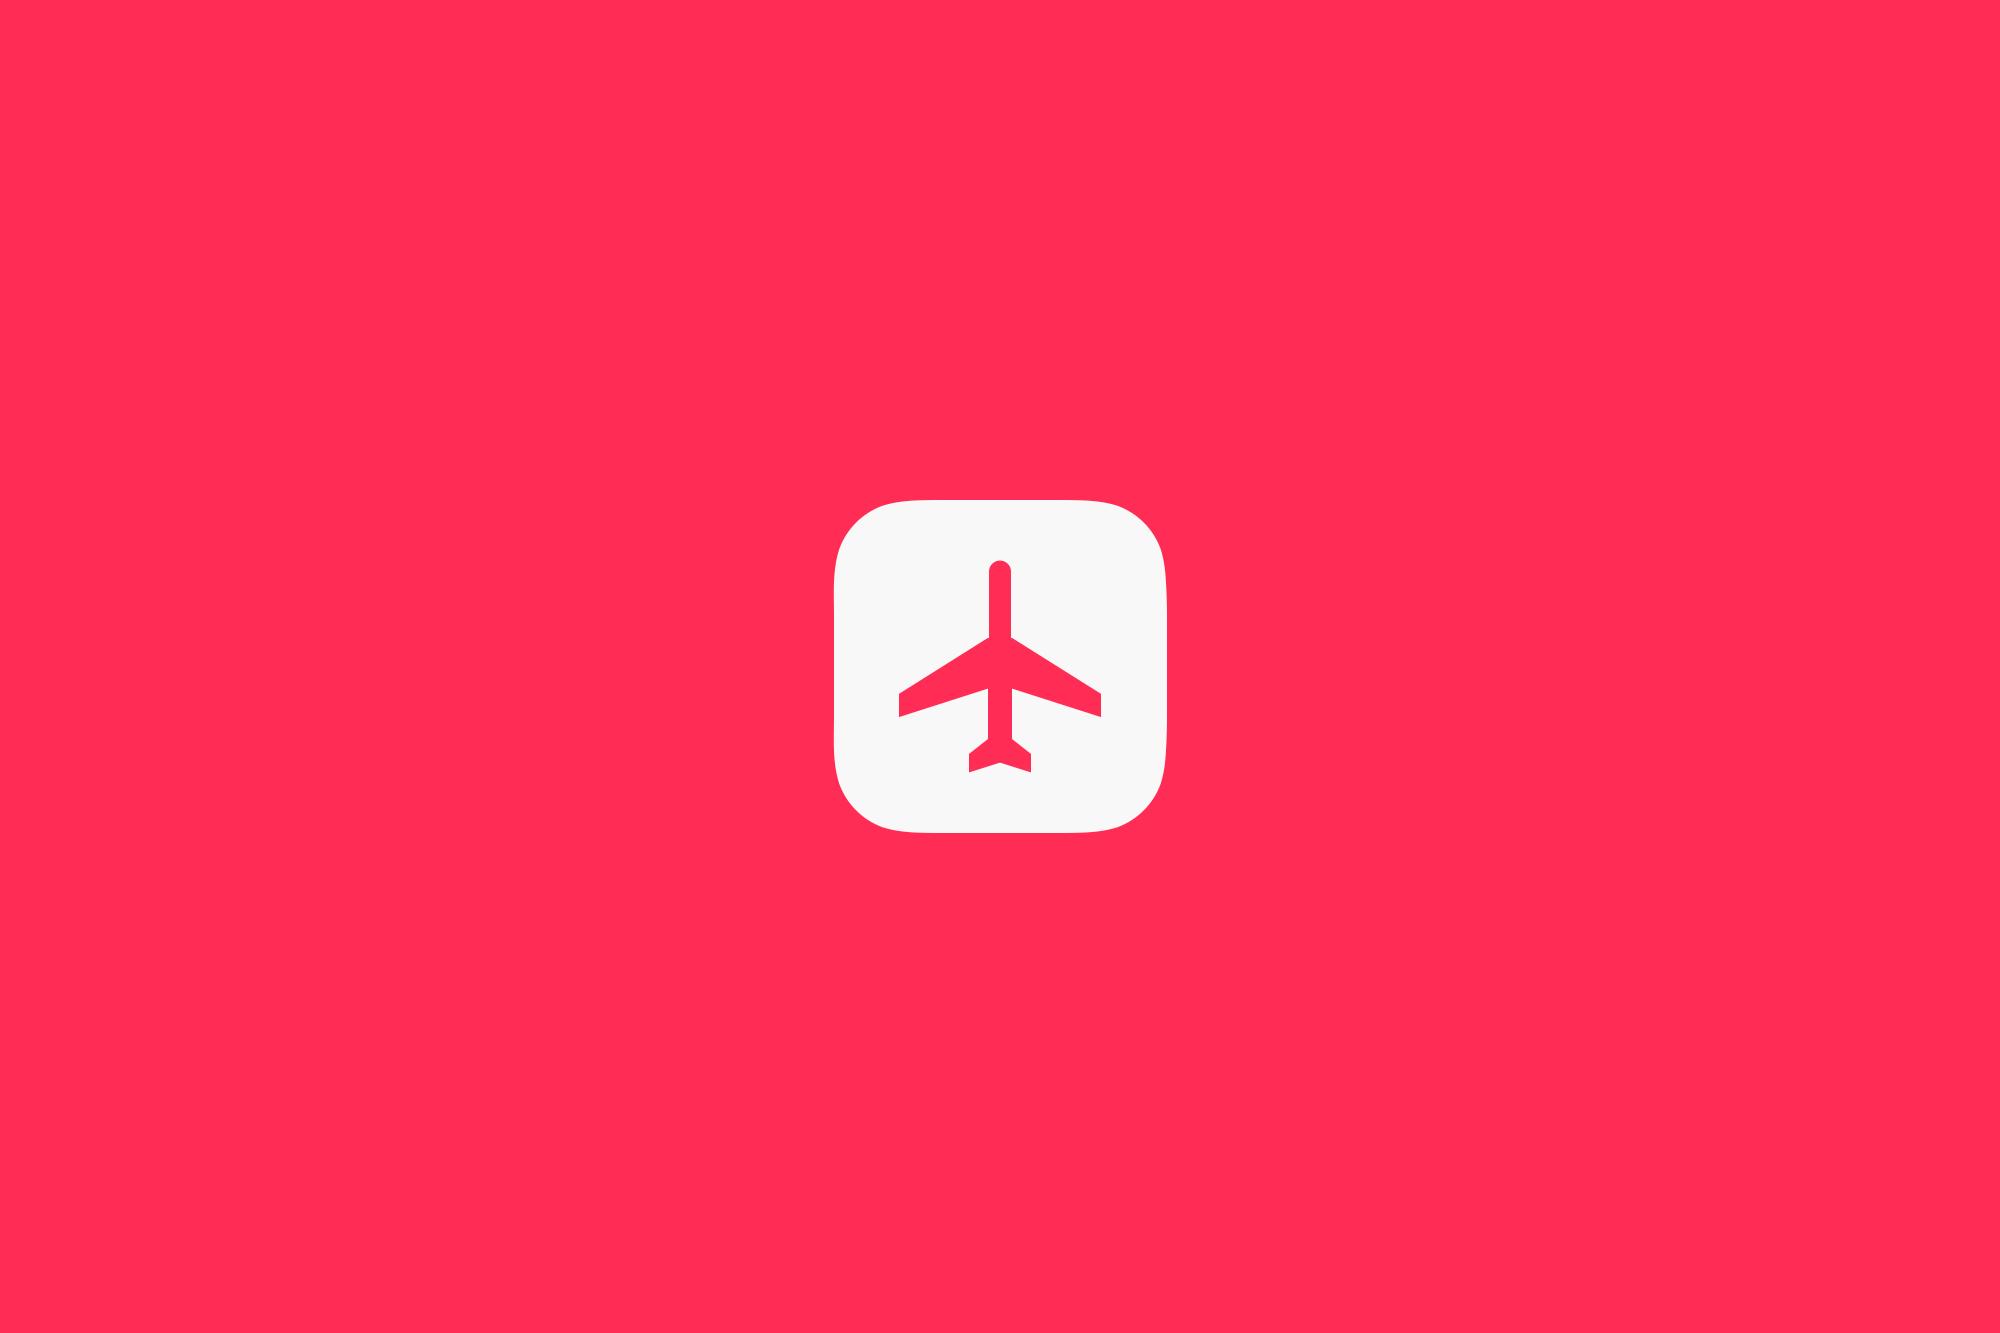 Flughafenapp.png